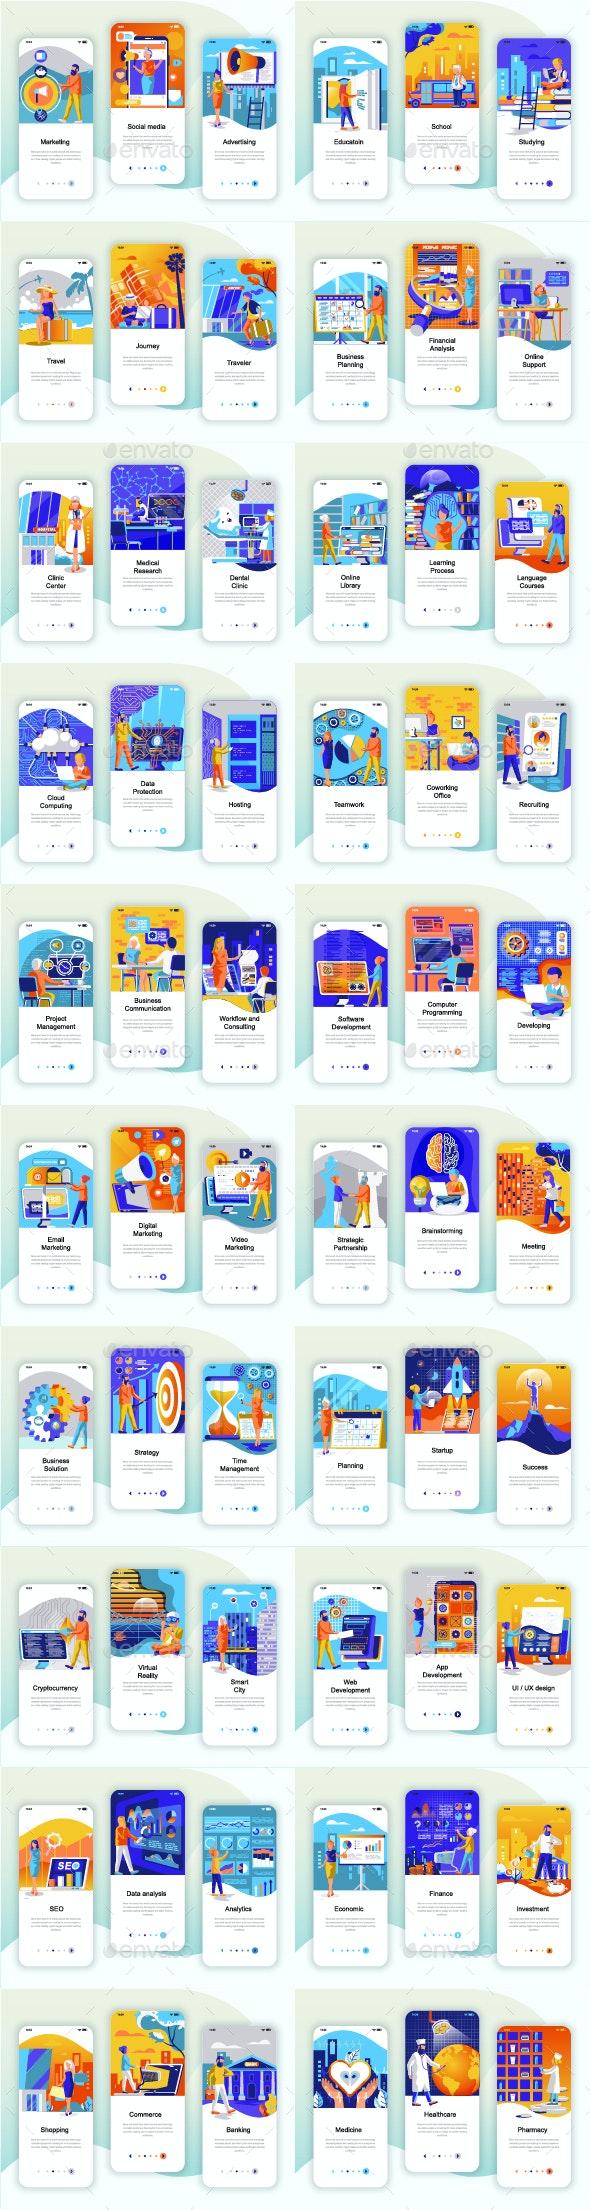 Instagram Stories Mobile App - Concepts Business